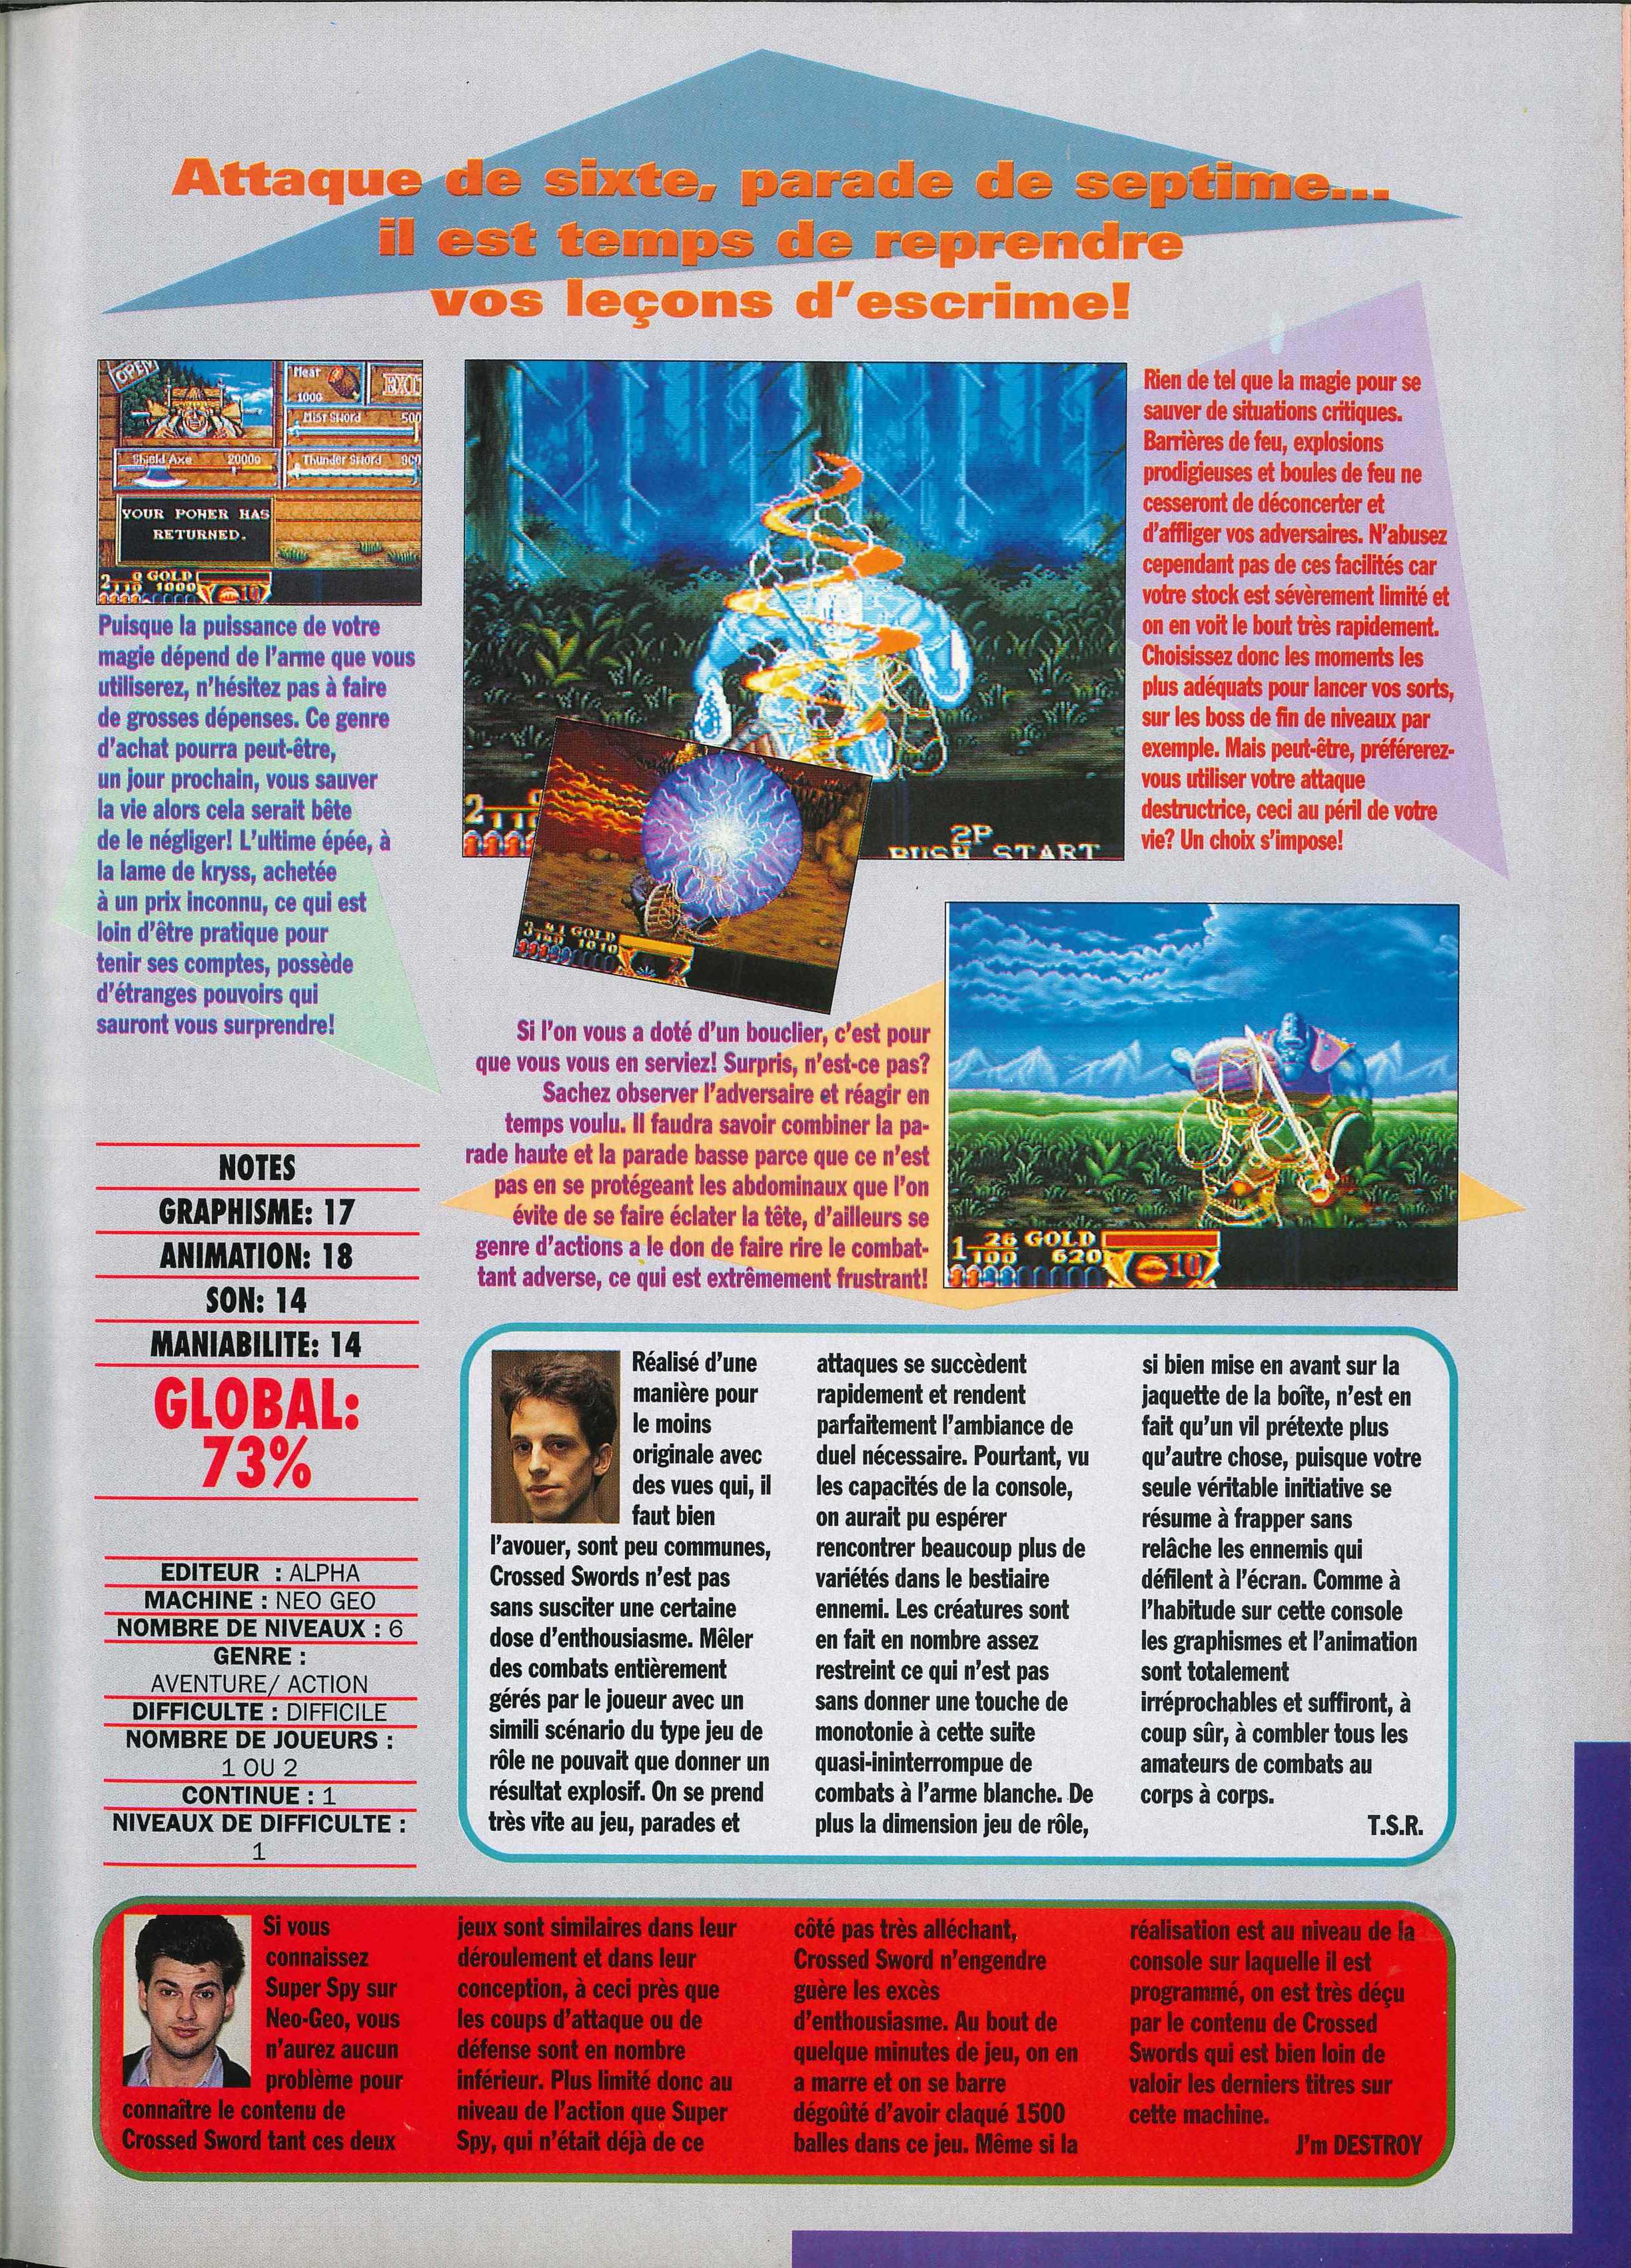 La NEO•GEO dans la presse - Volume II (1991) Joypad%20003%20-%20Page%20125%20%281991-12%29